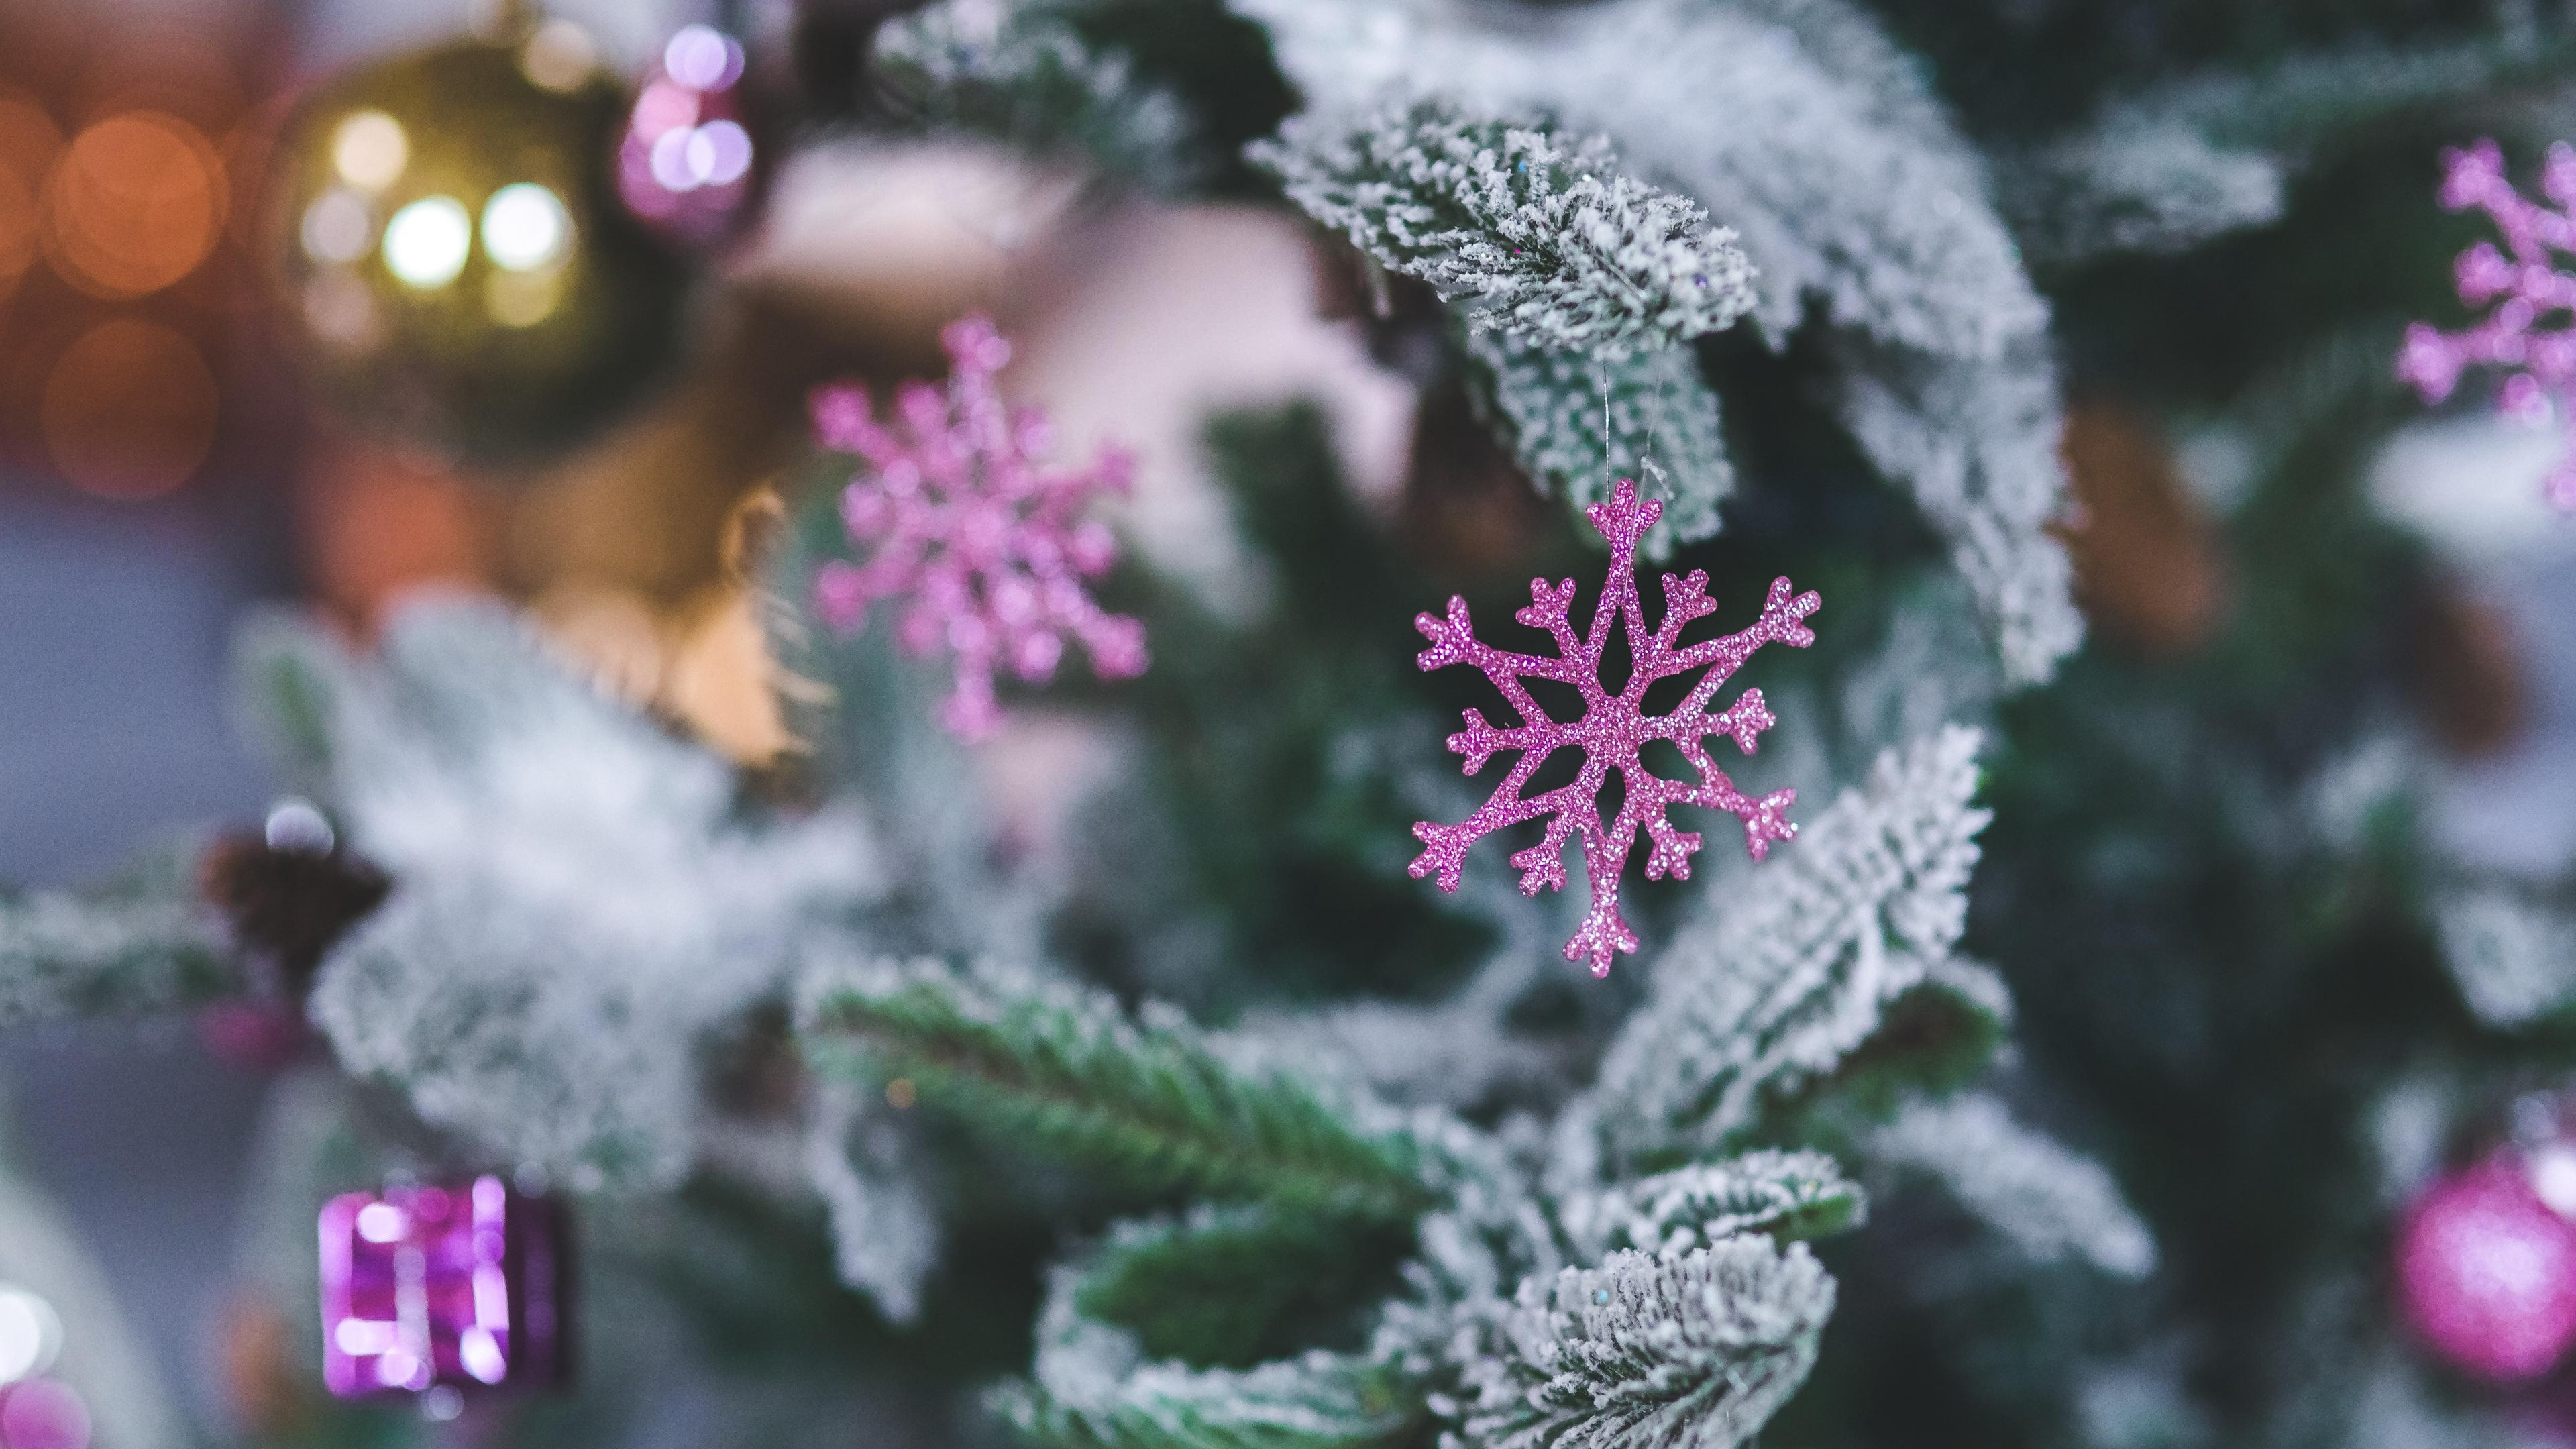 snowflake christmas decoration spruce 4k 1538344749 - snowflake, christmas decoration, spruce 4k - spruce, snowflake, christmas decoration